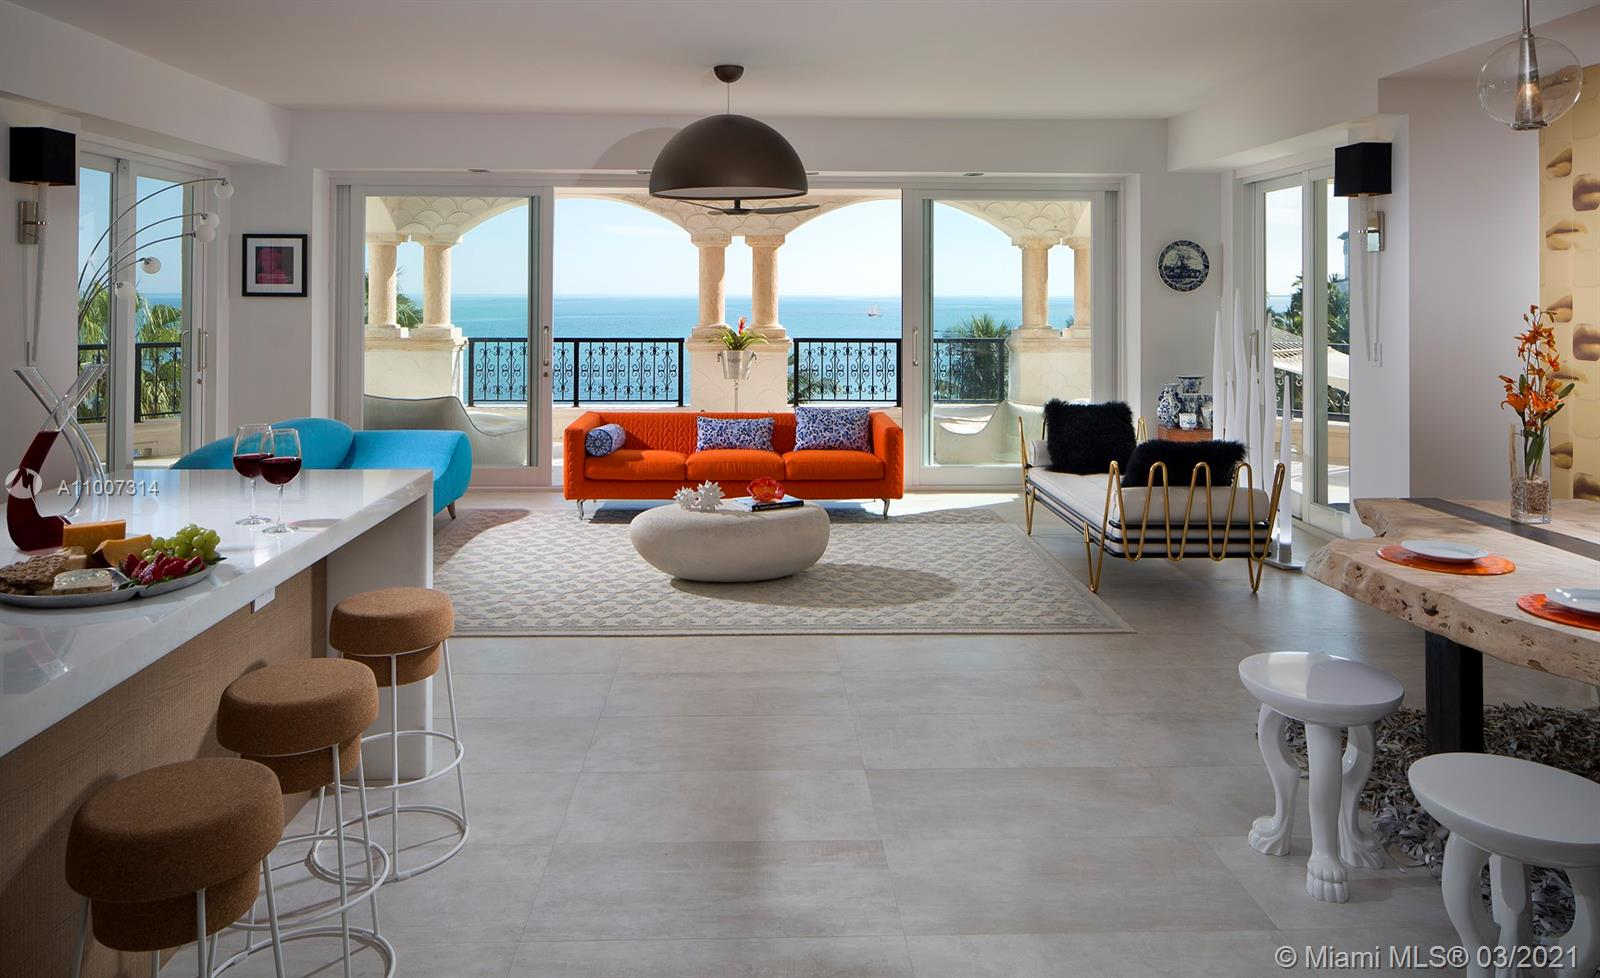 Oceanside #7745 - 7745 S Fisher Island Dr #7745, Miami Beach, FL 33109